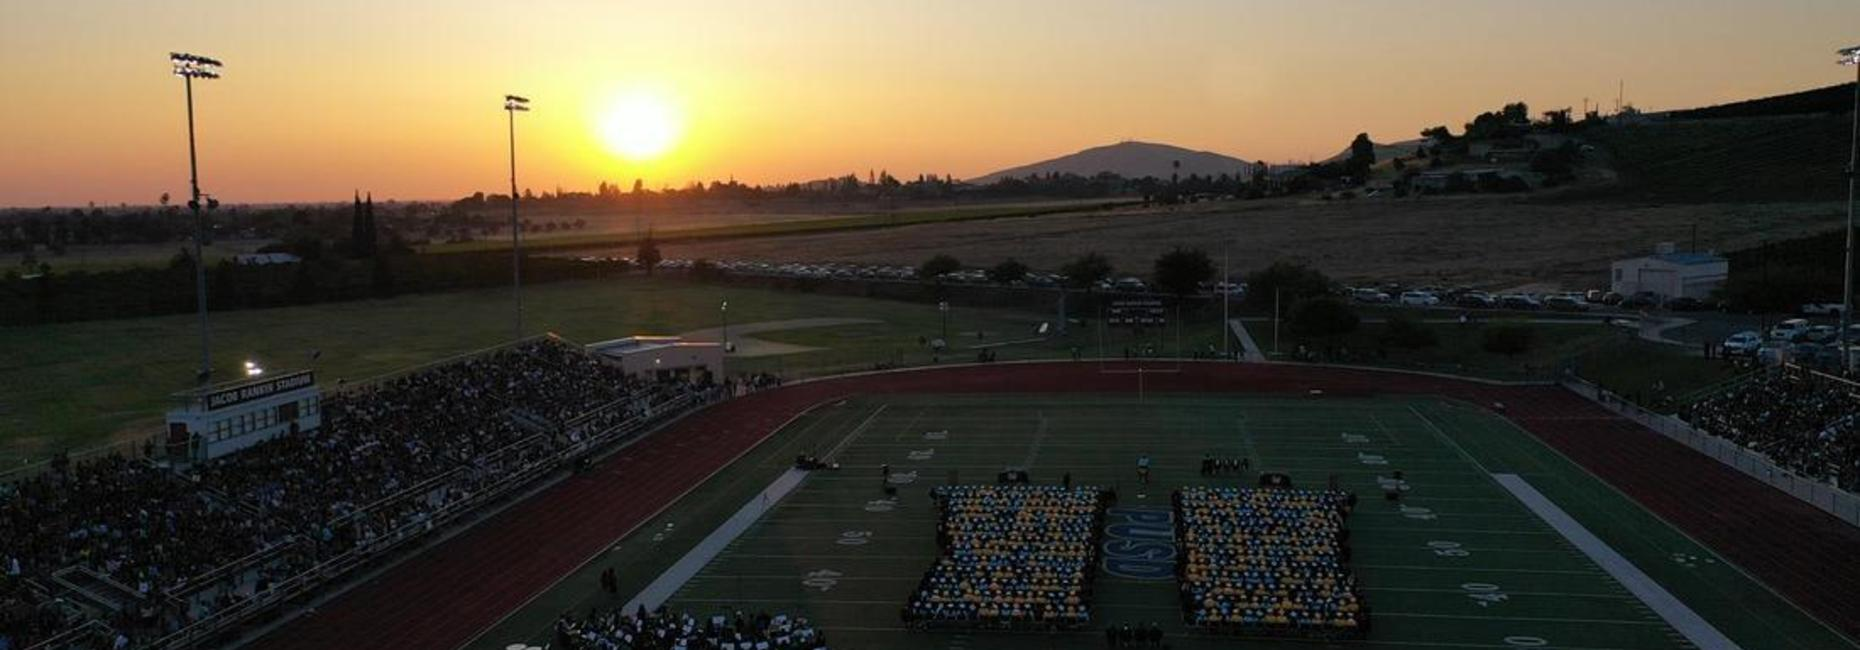 Drone Graduation